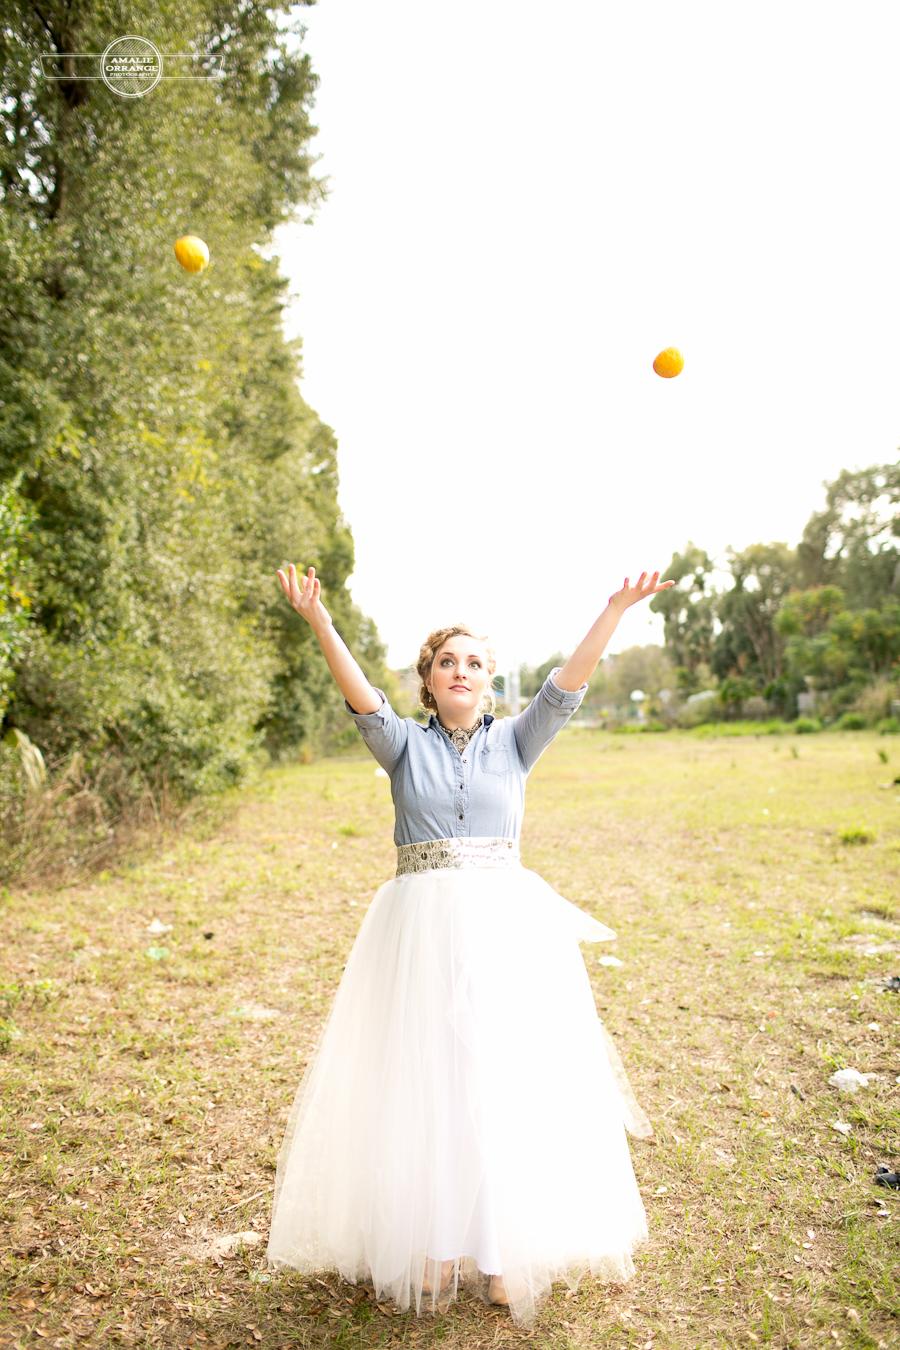 girl throwing lemons